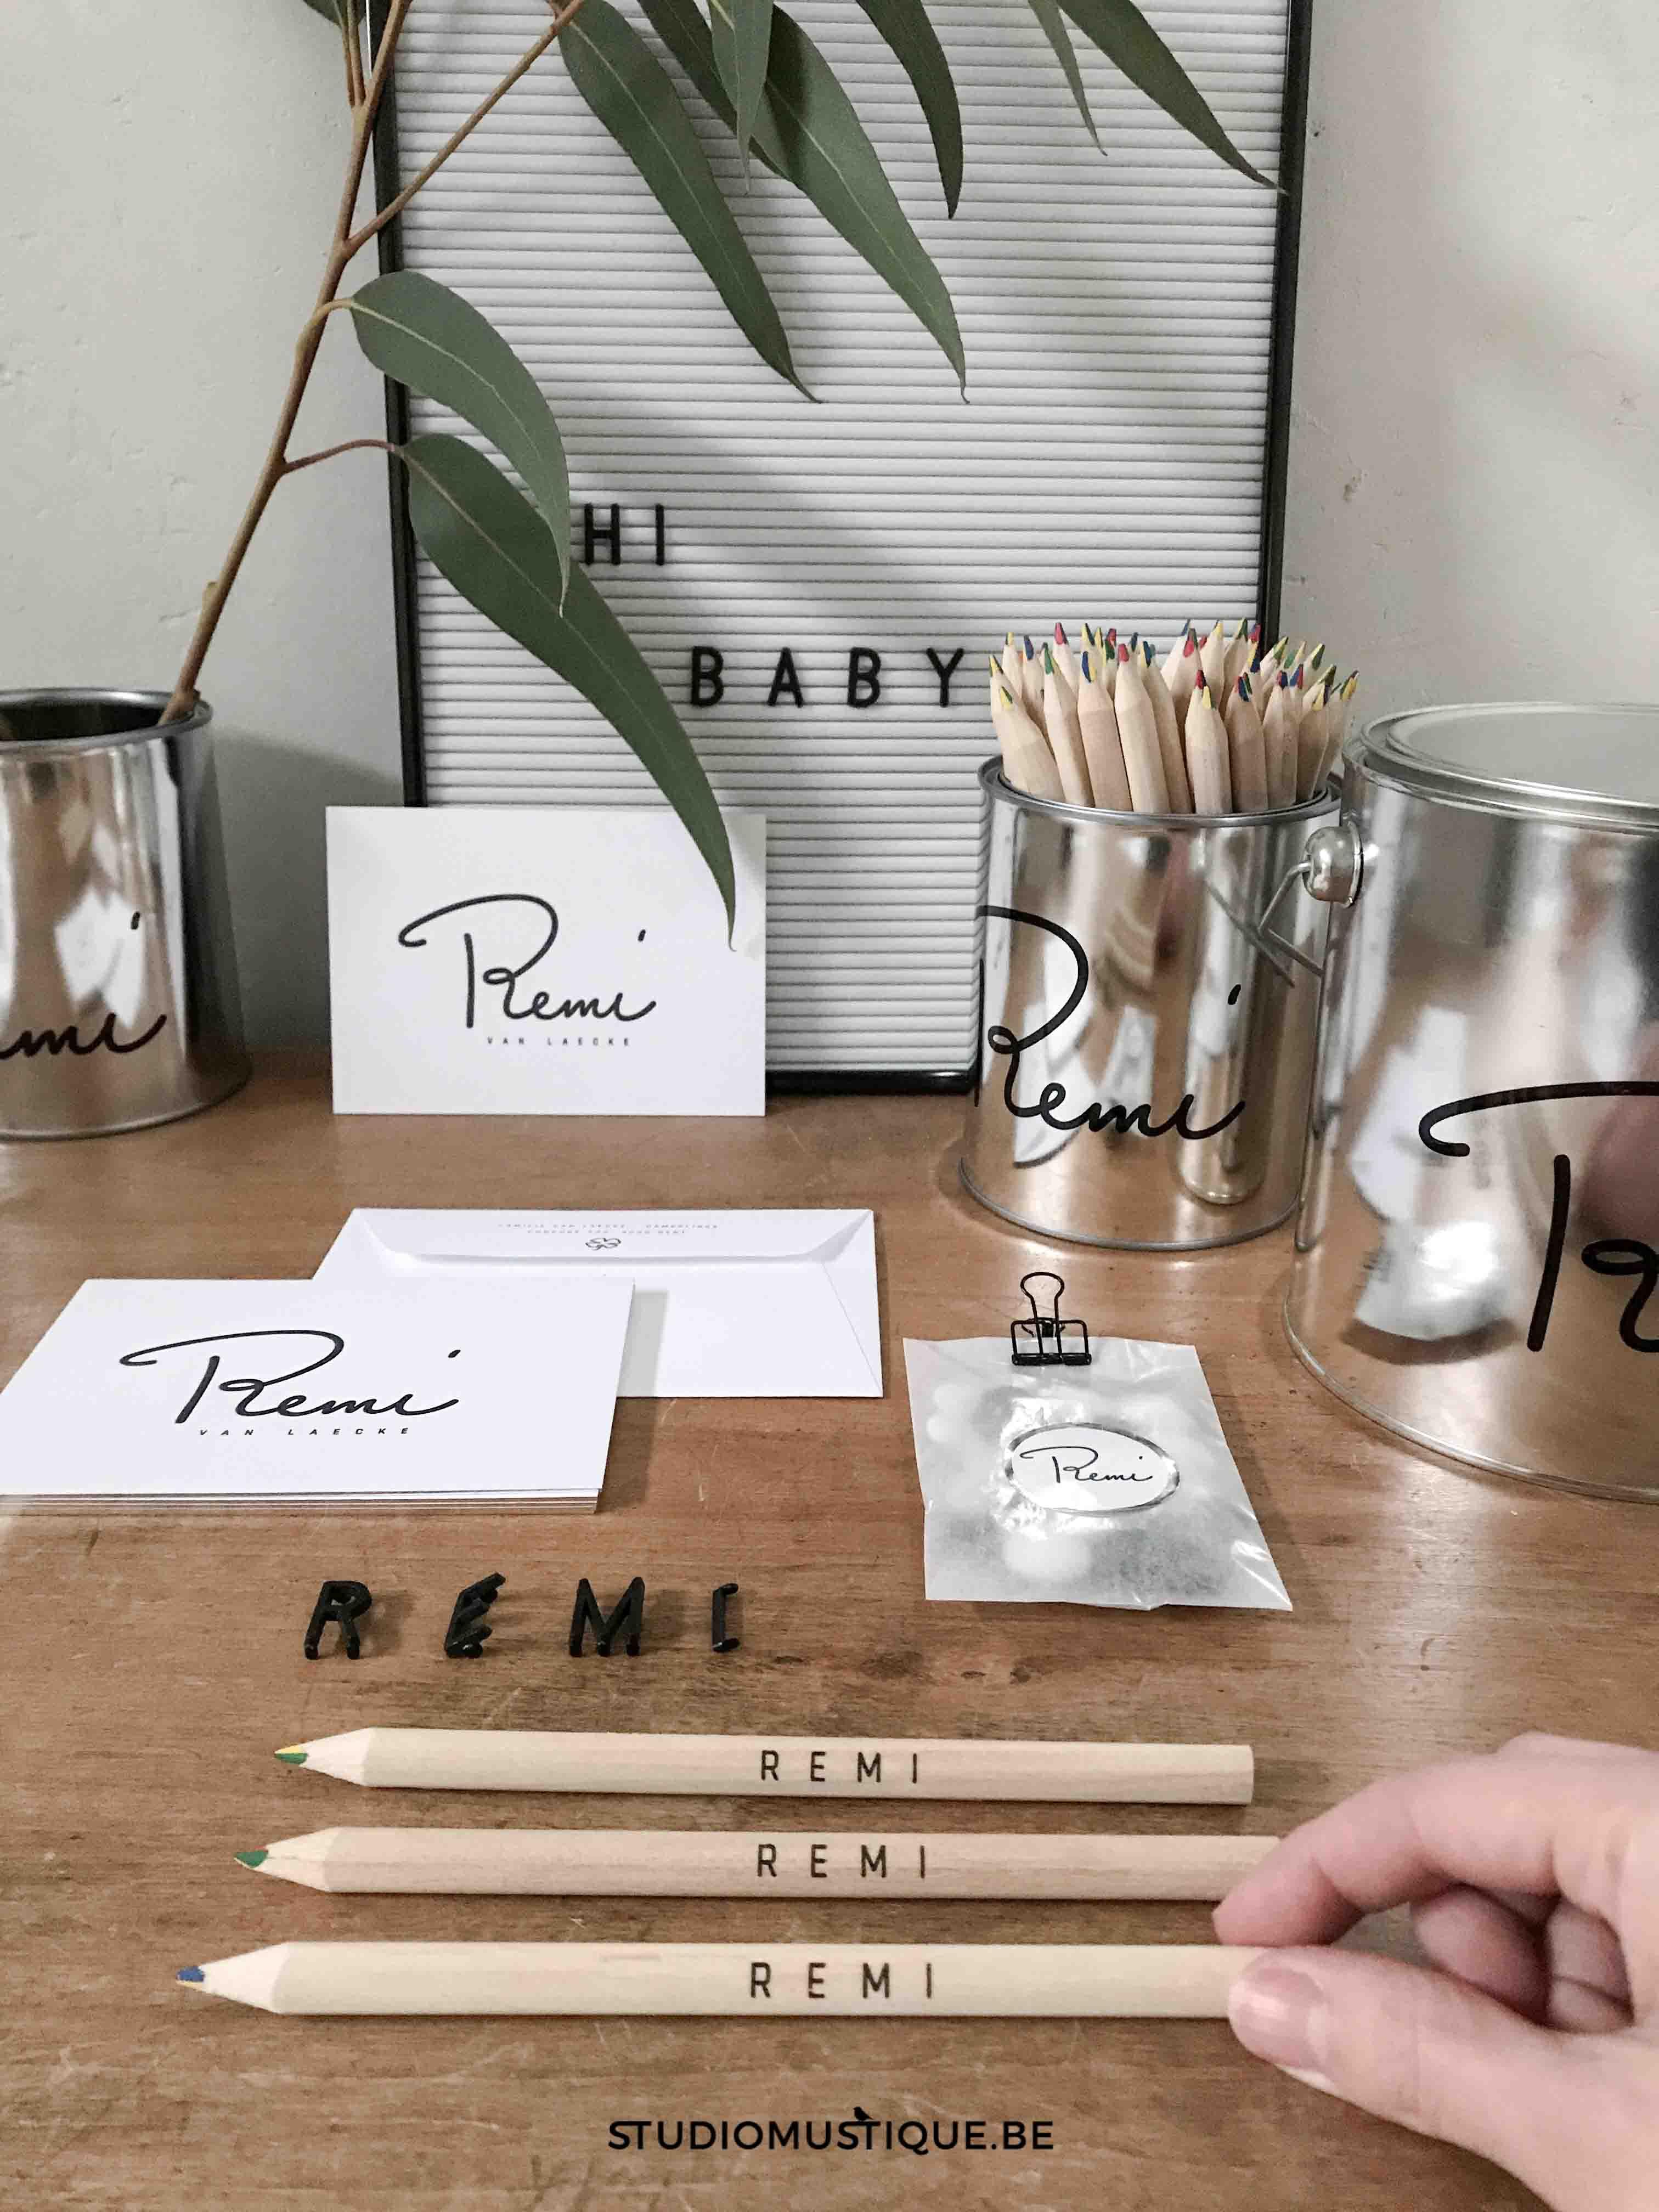 Geboortekaartje Remi, letterpress, zilverfolie op snee, handettering, studiomustique.be